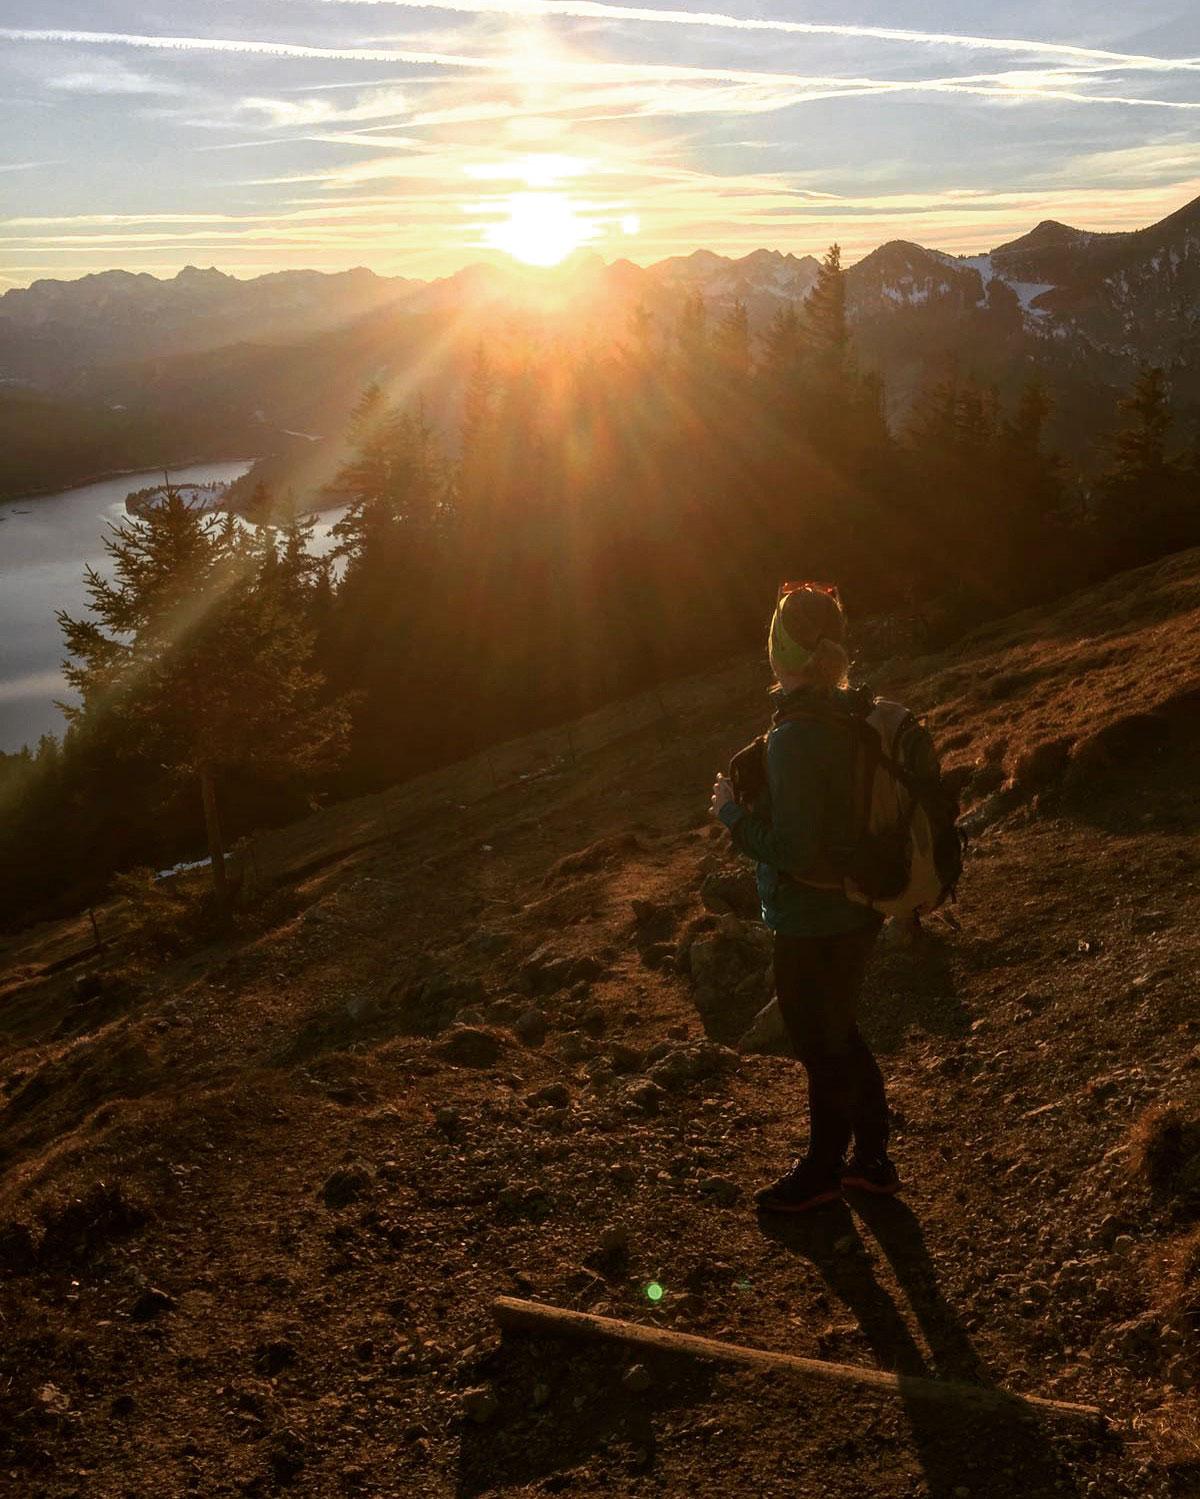 munichmountaingirls-bergblog-muenchen-julia-eisenhardt-wandern-karwendel-sonnenuntergang-jochberg-wanderung